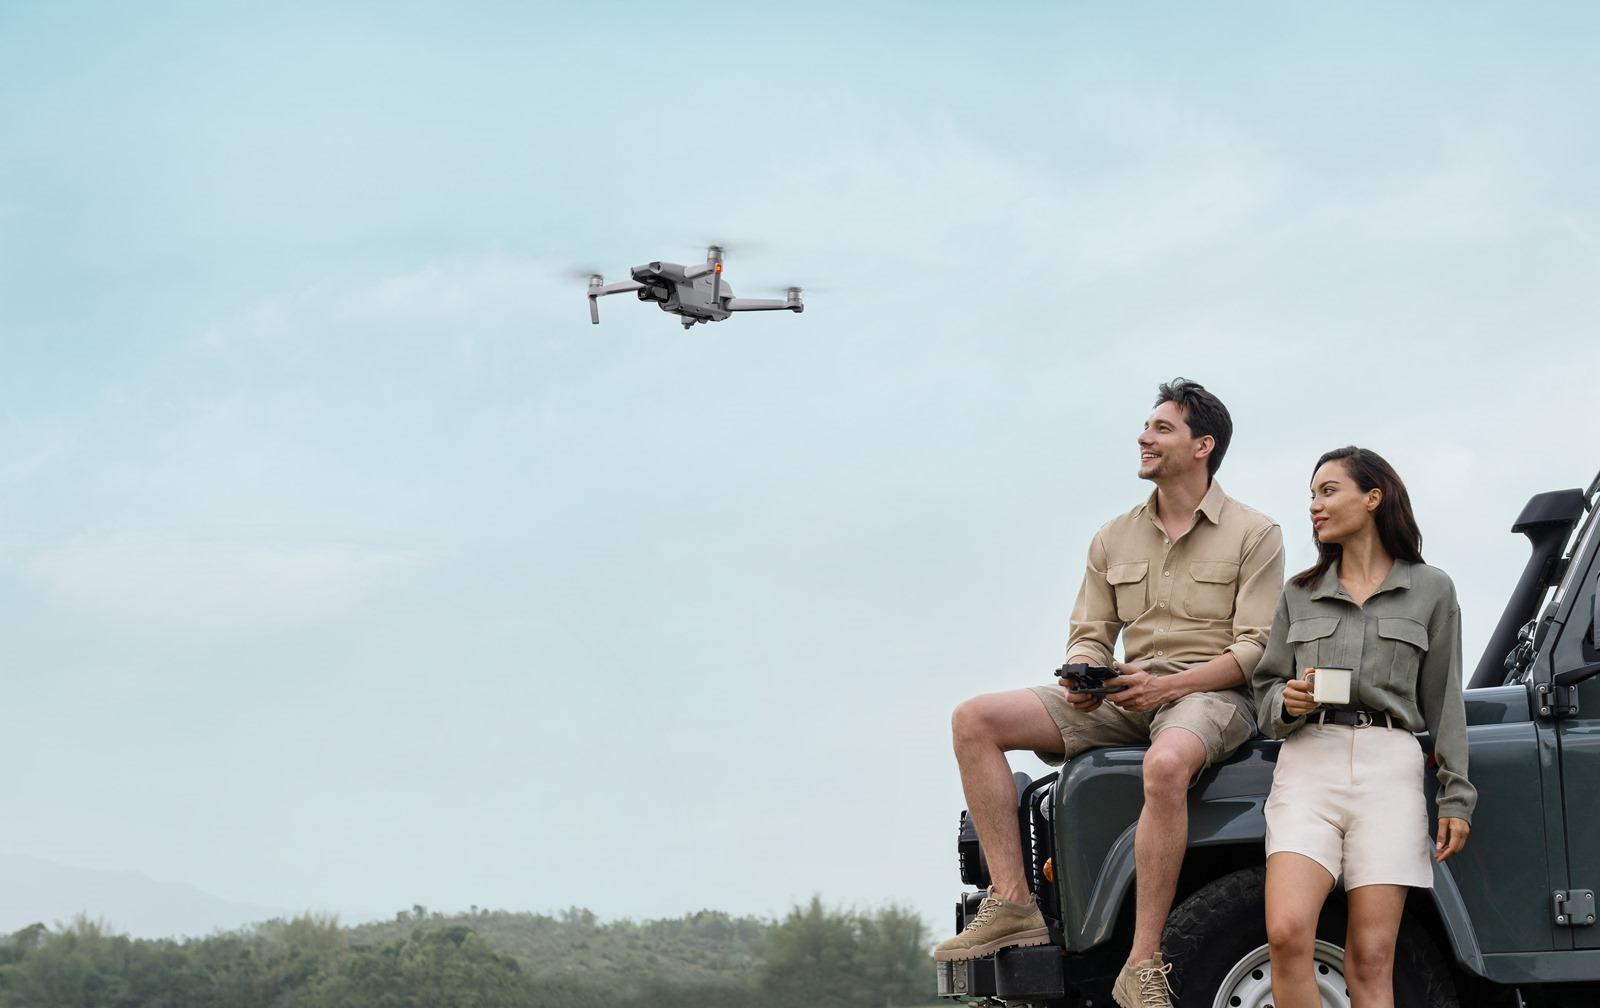 DJI 發佈 Mavic Air 2,令航拍創作更進一步!DJI 迄今為止最智能、安全、易用的消費級航拍機,革新航拍創作體驗 @3C 達人廖阿輝